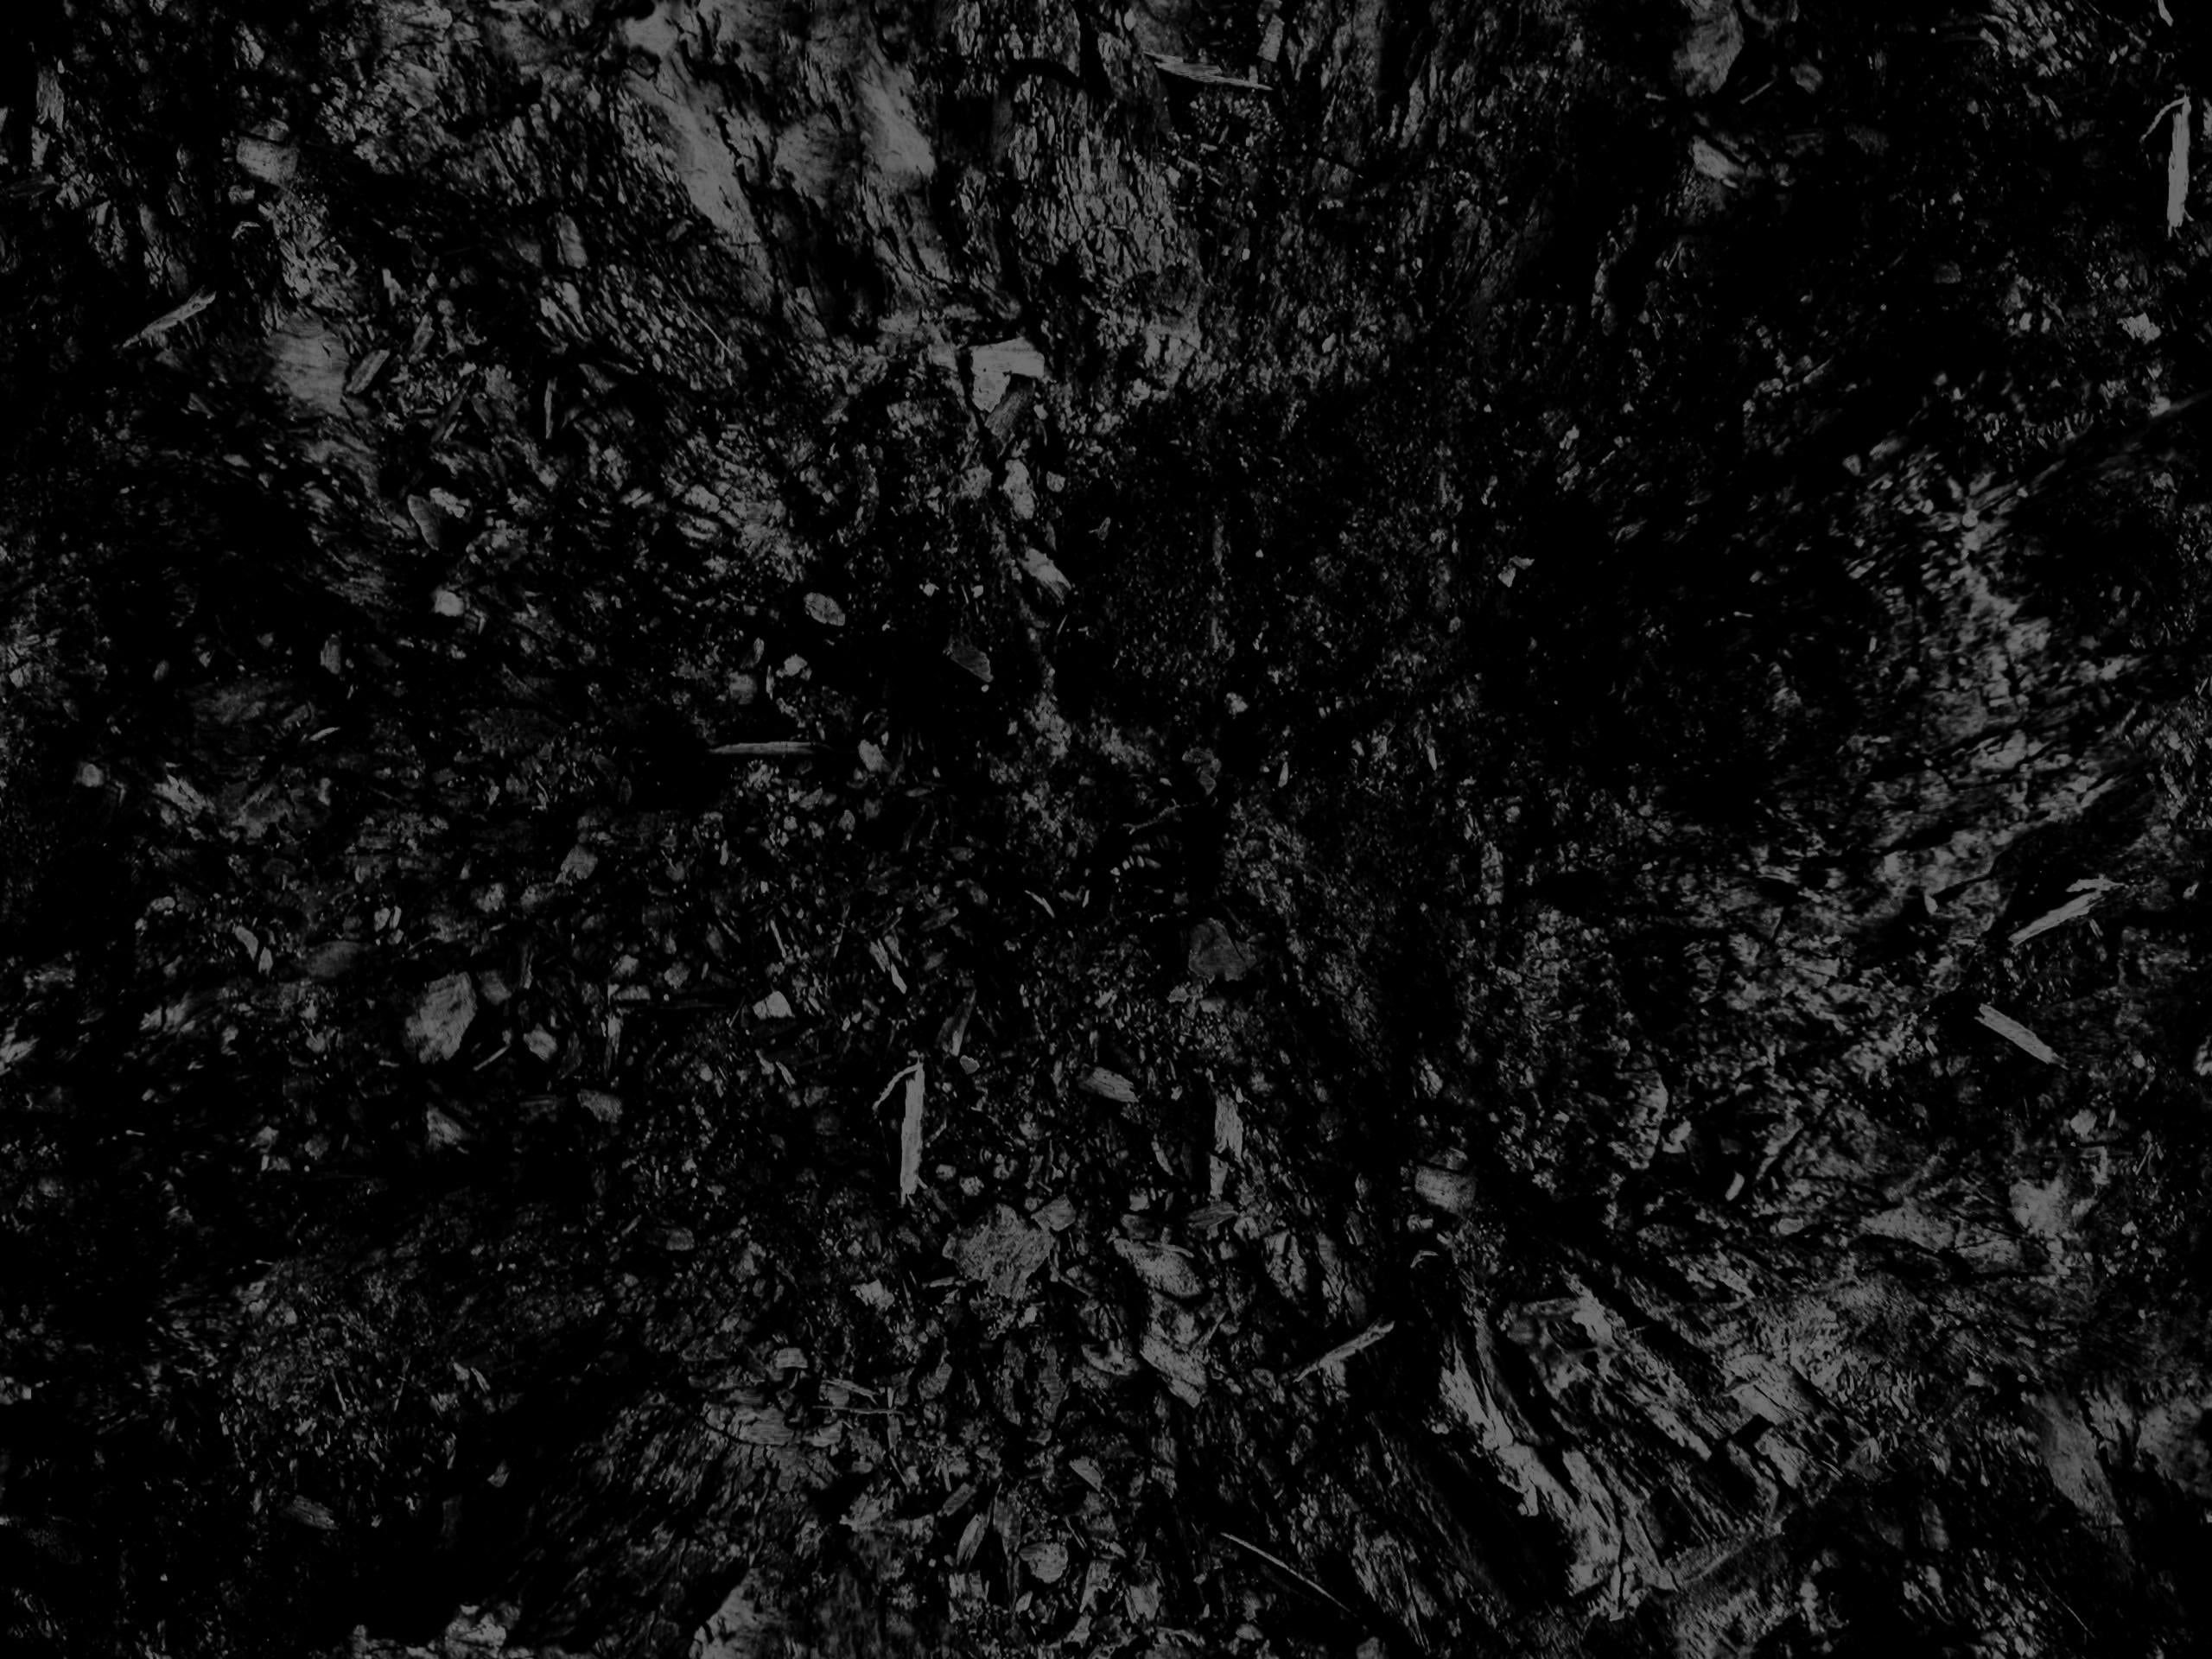 Dark Black And White Abstract Black Background 2k Wallpaper Hdwallpaper Desktop In 2020 Black Hd Wallpaper Dark Wallpaper 2048x1152 Wallpapers